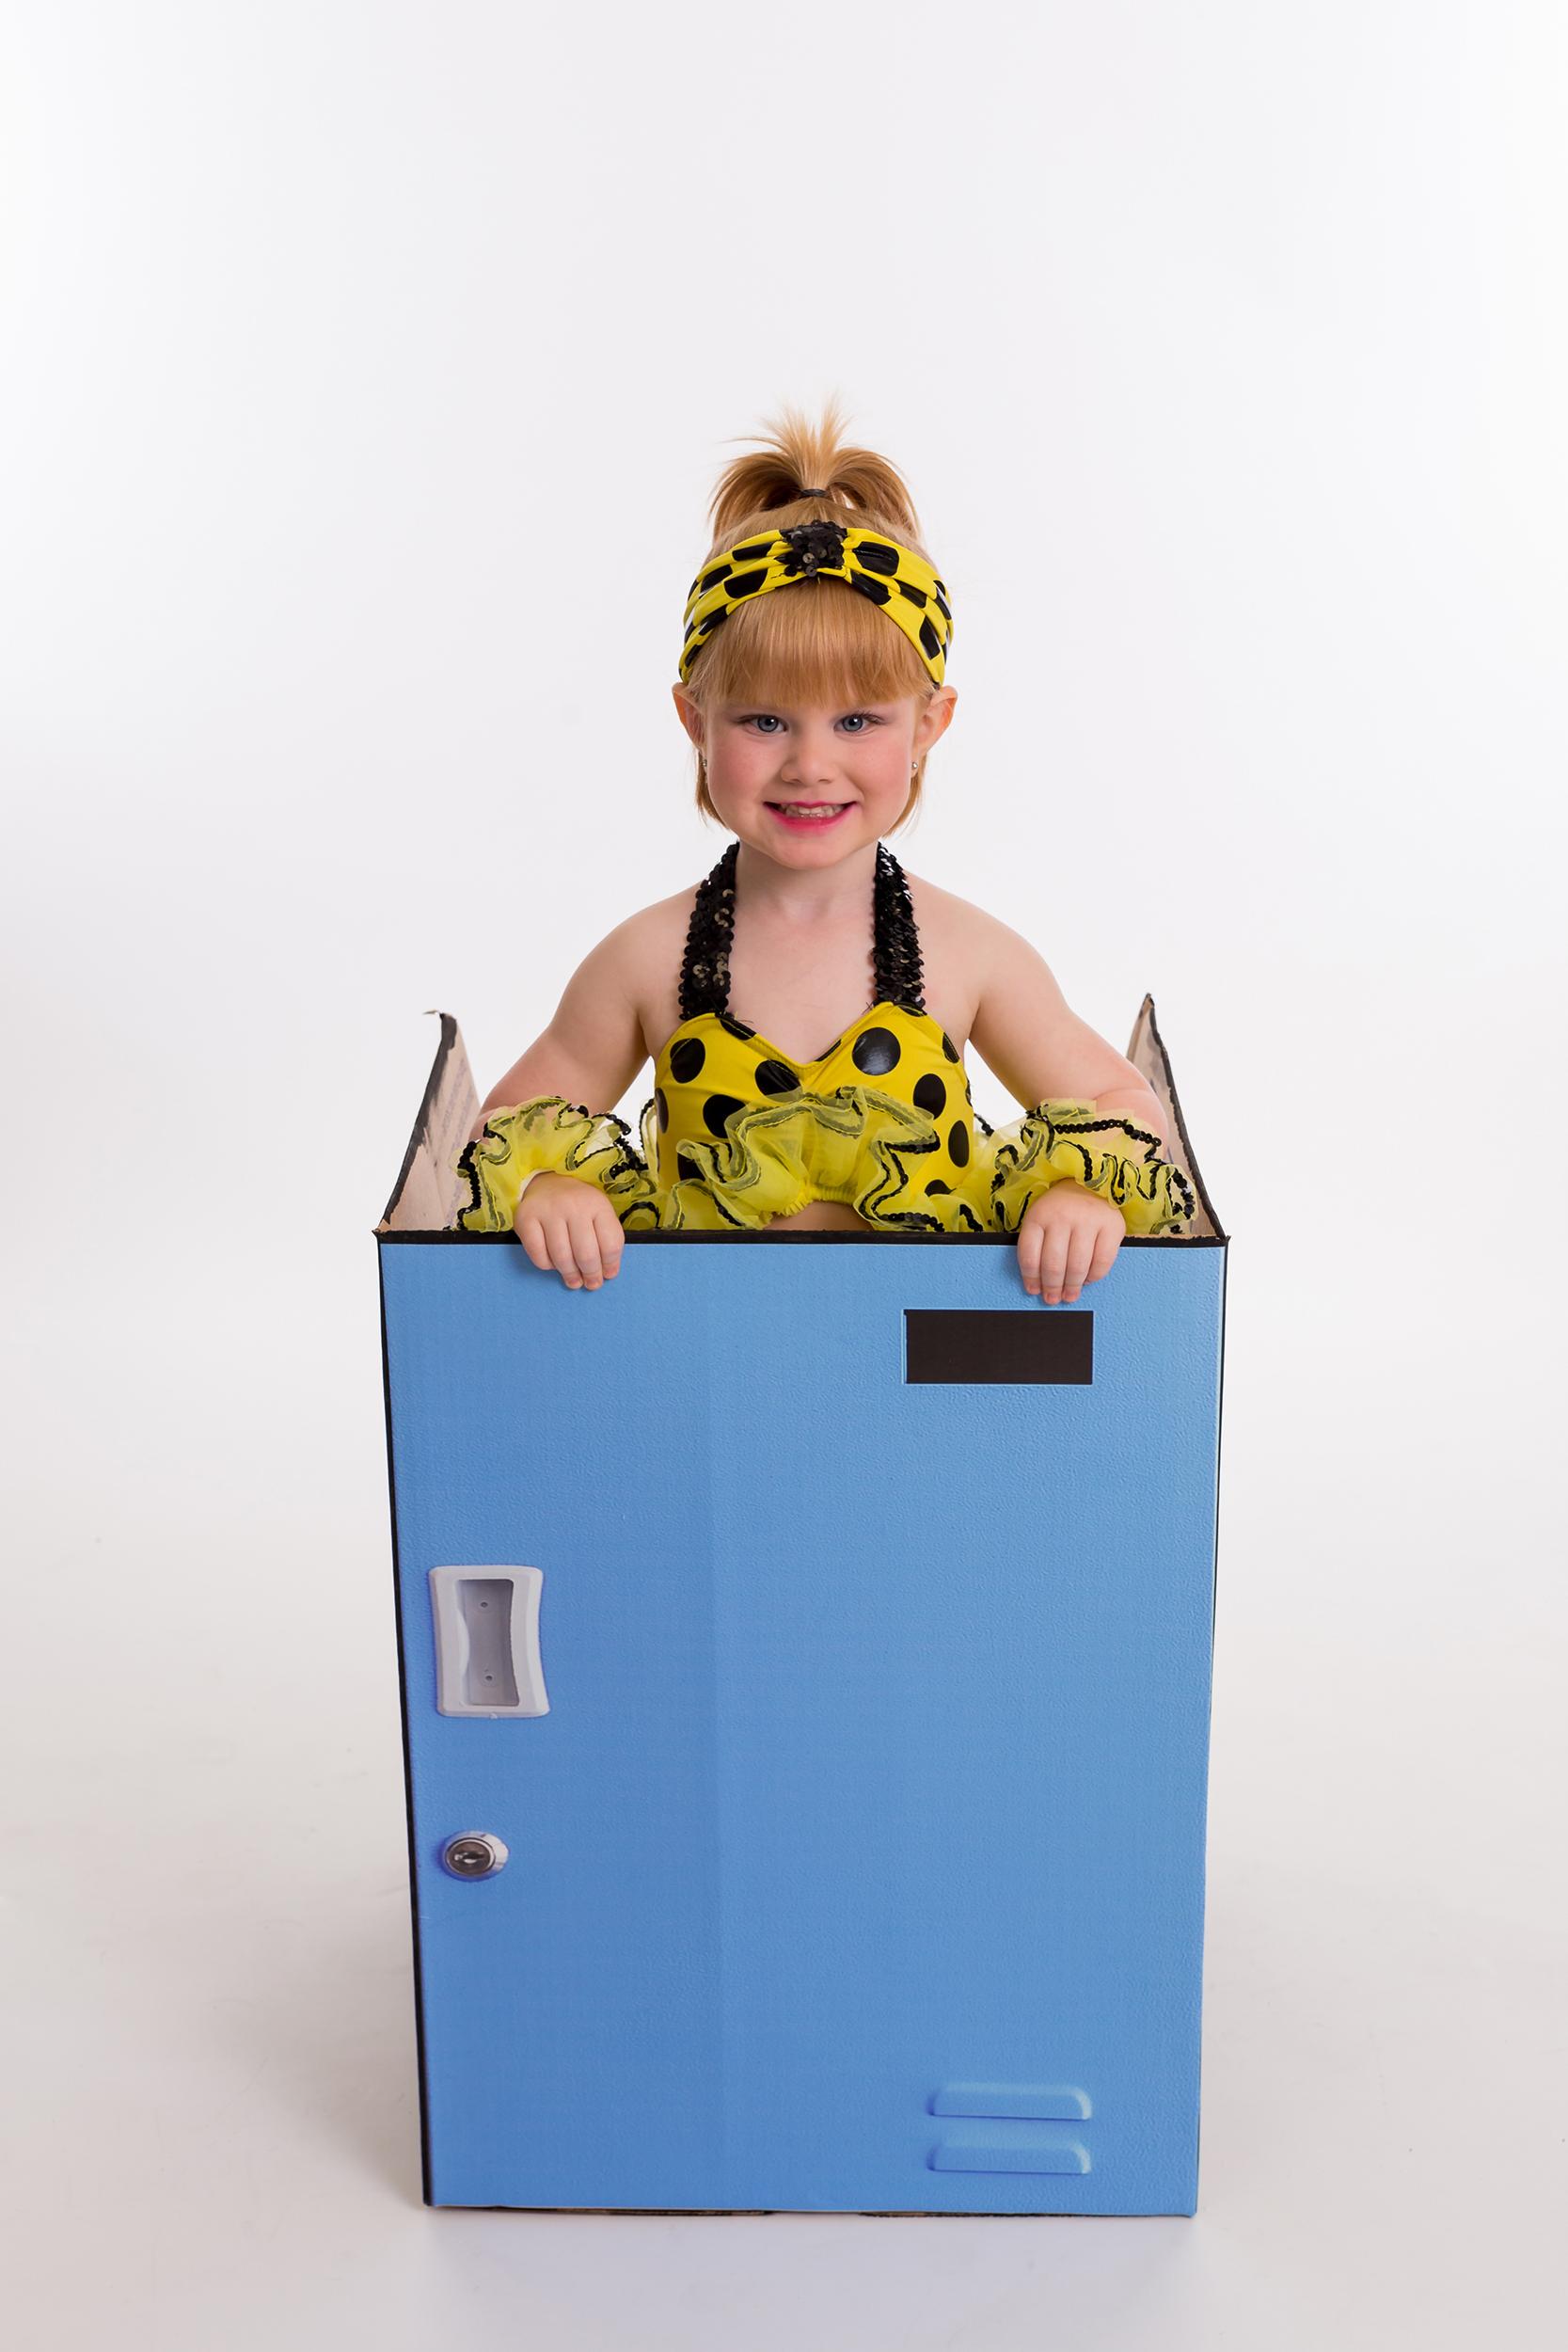 Girl-dance-yellow-polkadot-costume.jpg